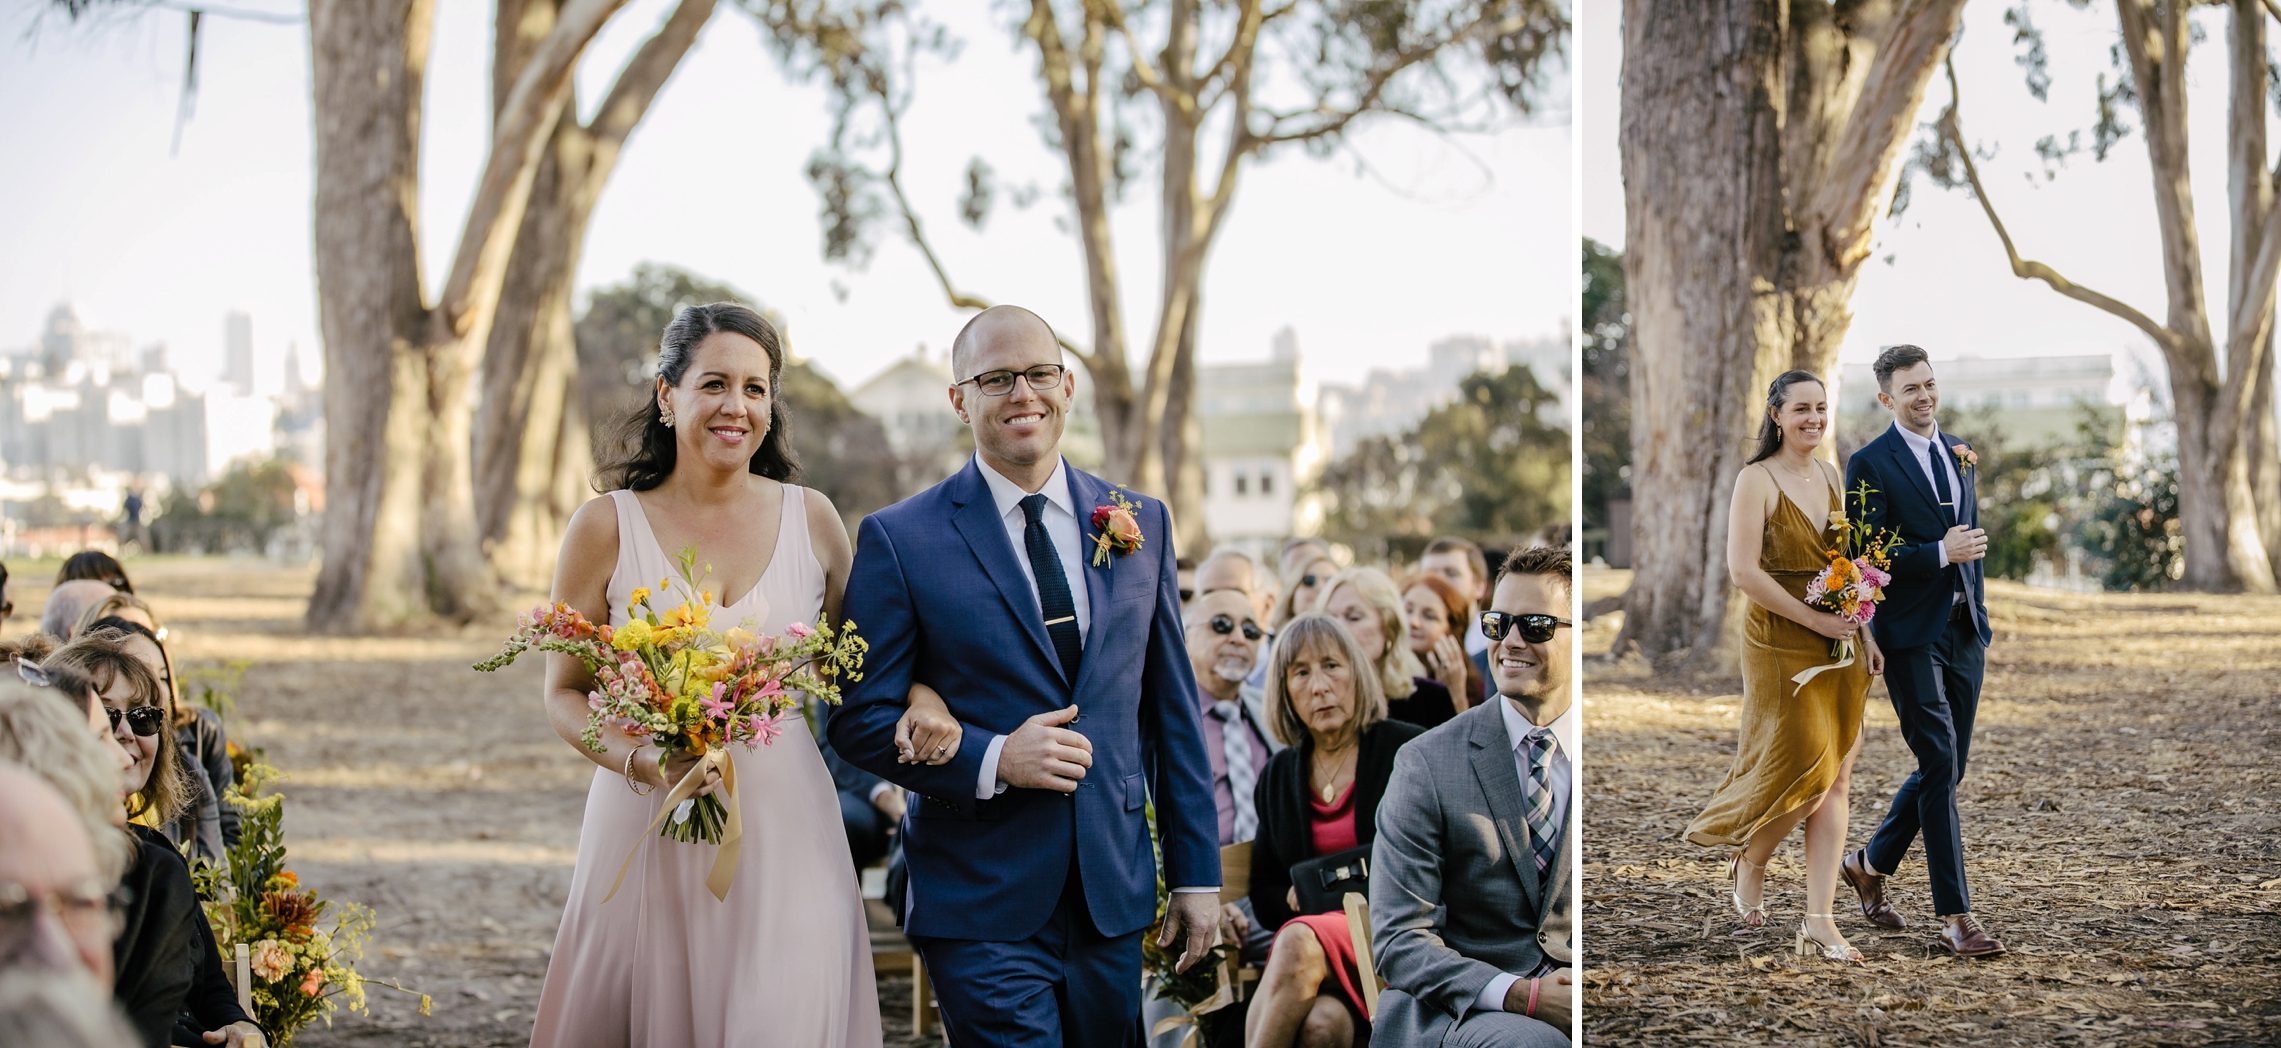 fort-mason-gallery-308-wedding_0032.jpg